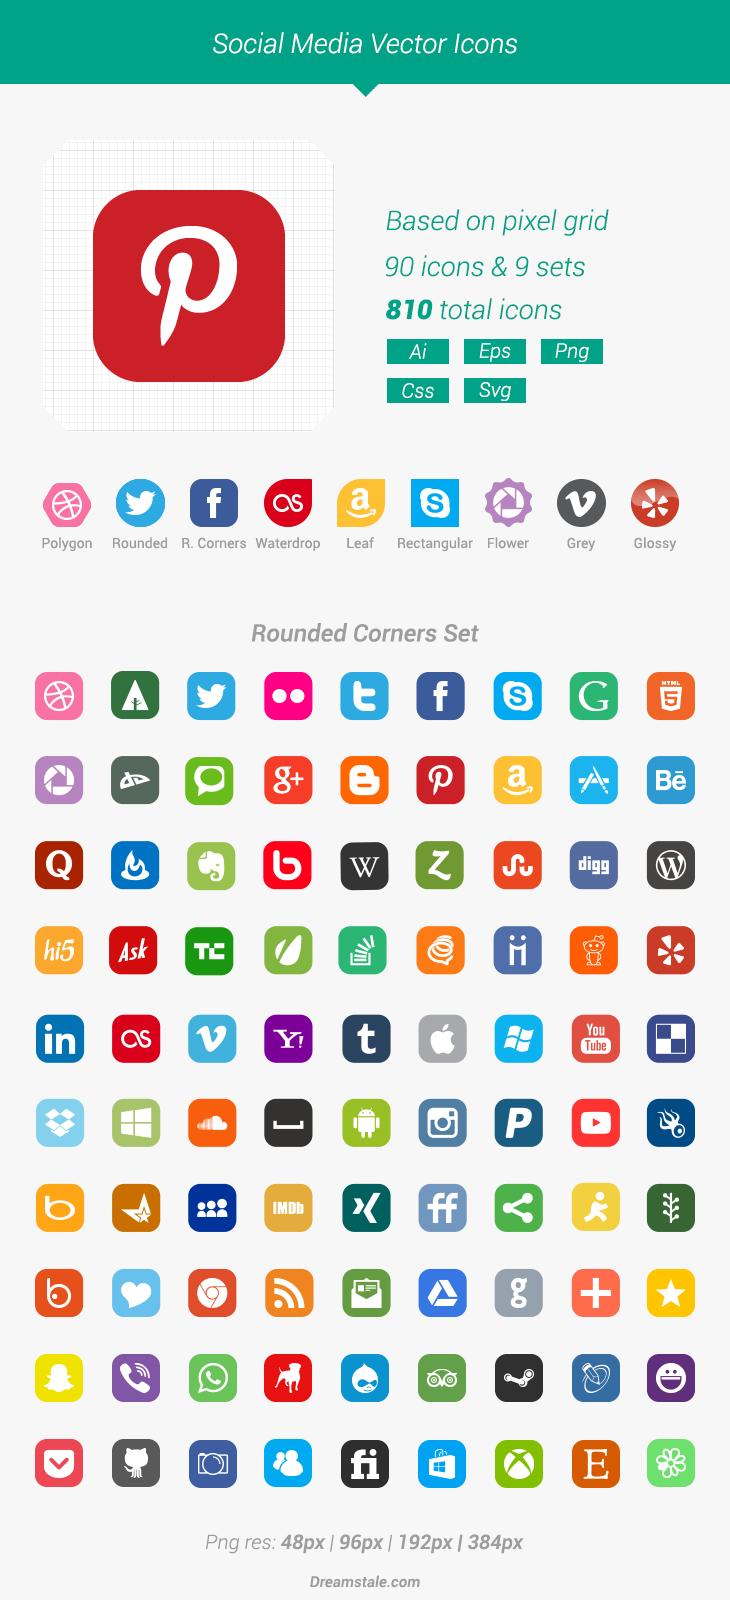 freebie-90-free-social-media-vector-icons